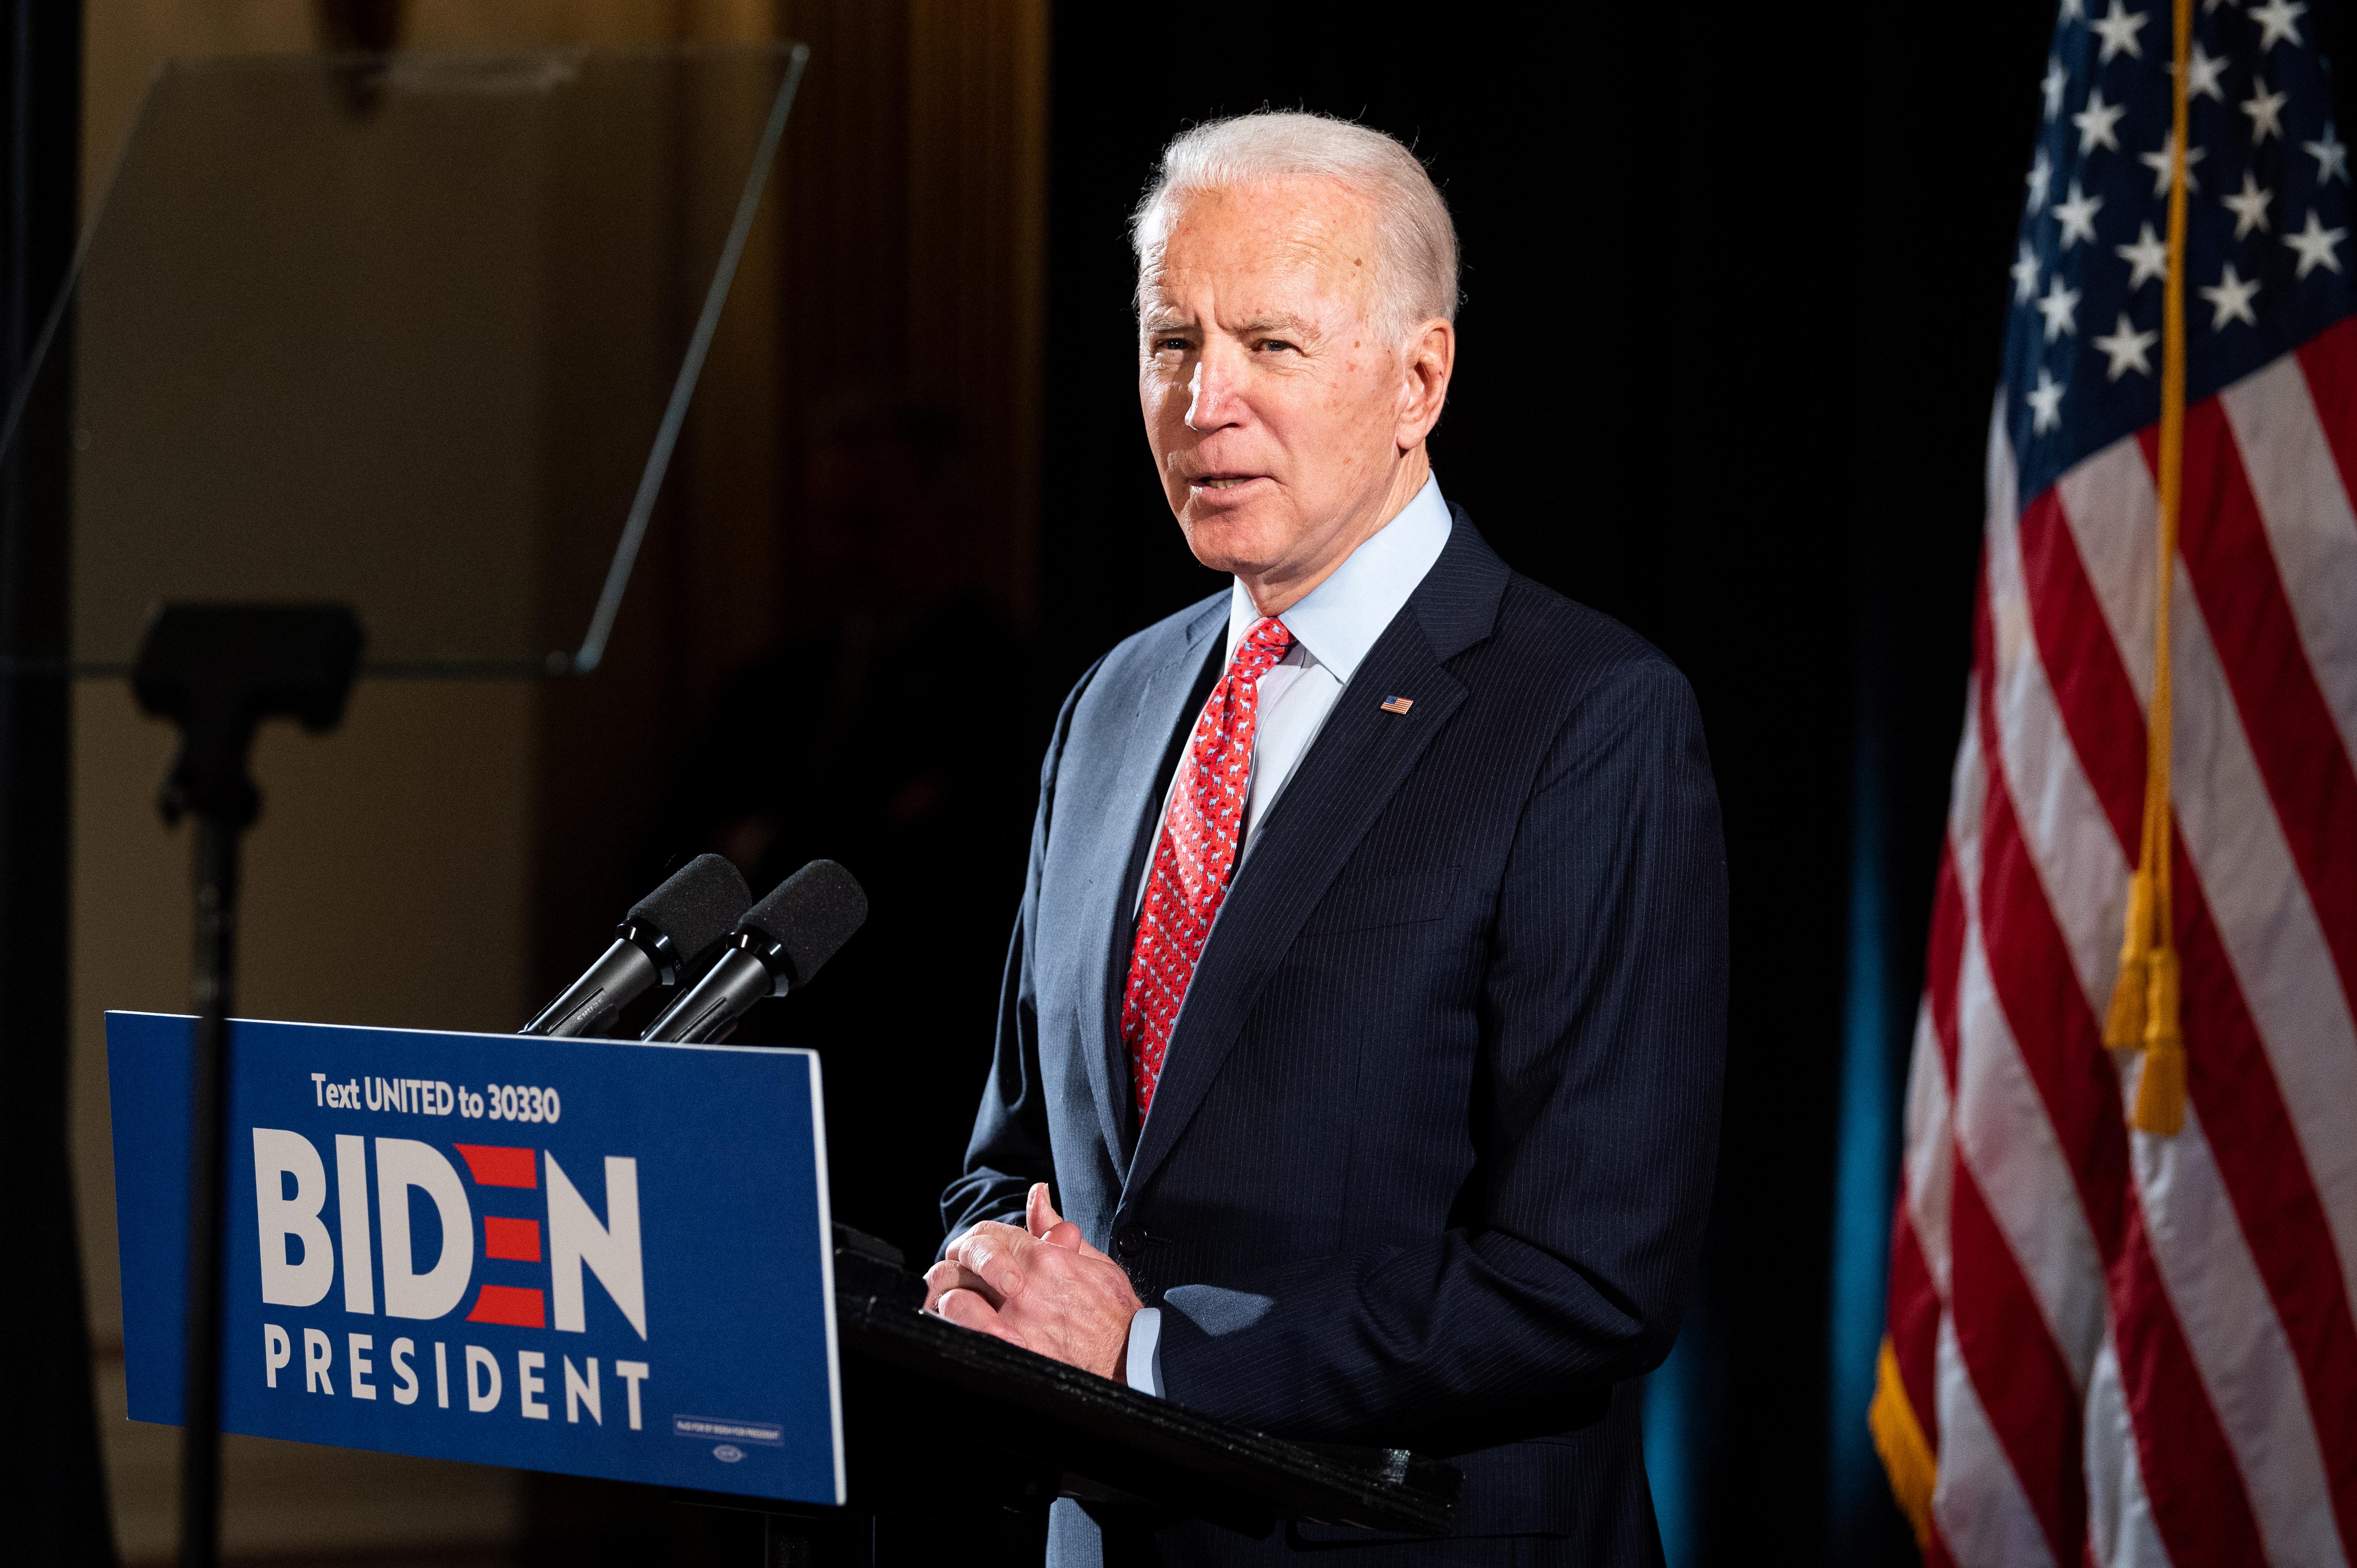 Joe Biden speaks at the Hotel Du Pont in Wilmington, Del. on March 20, 2020.